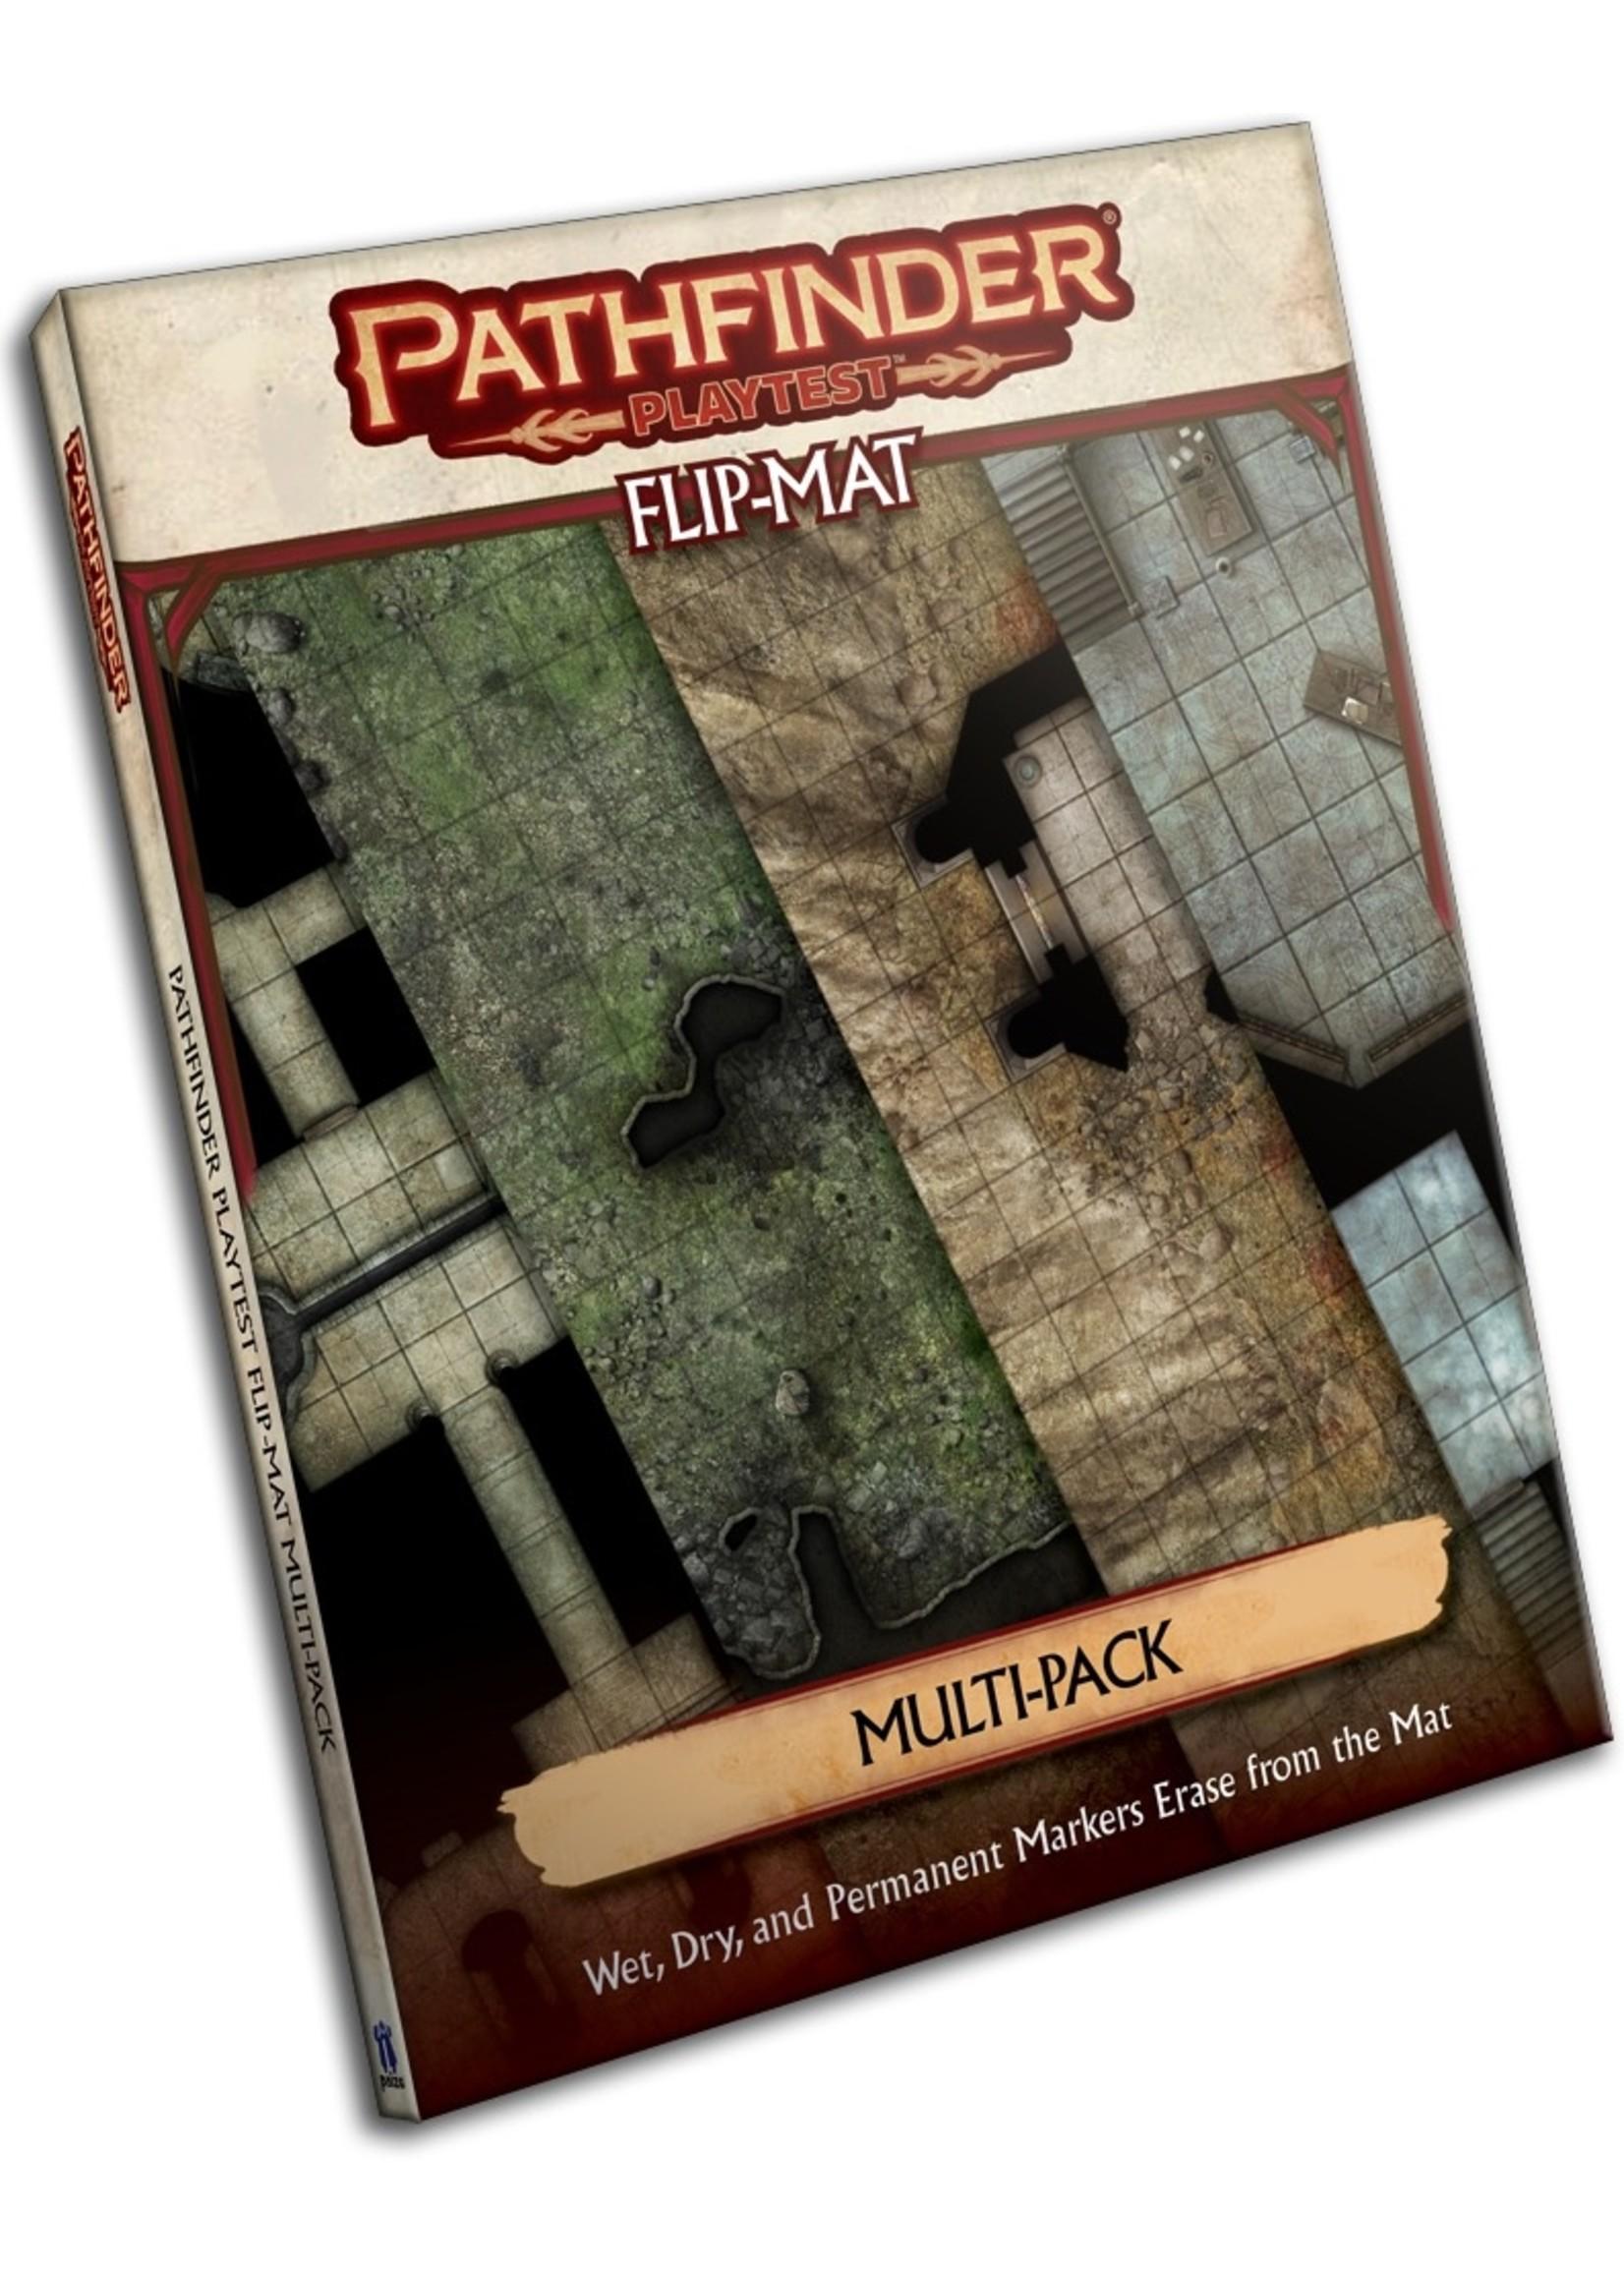 Pathfinder Playtest RPG: Flip-Mat - Multi-Pack